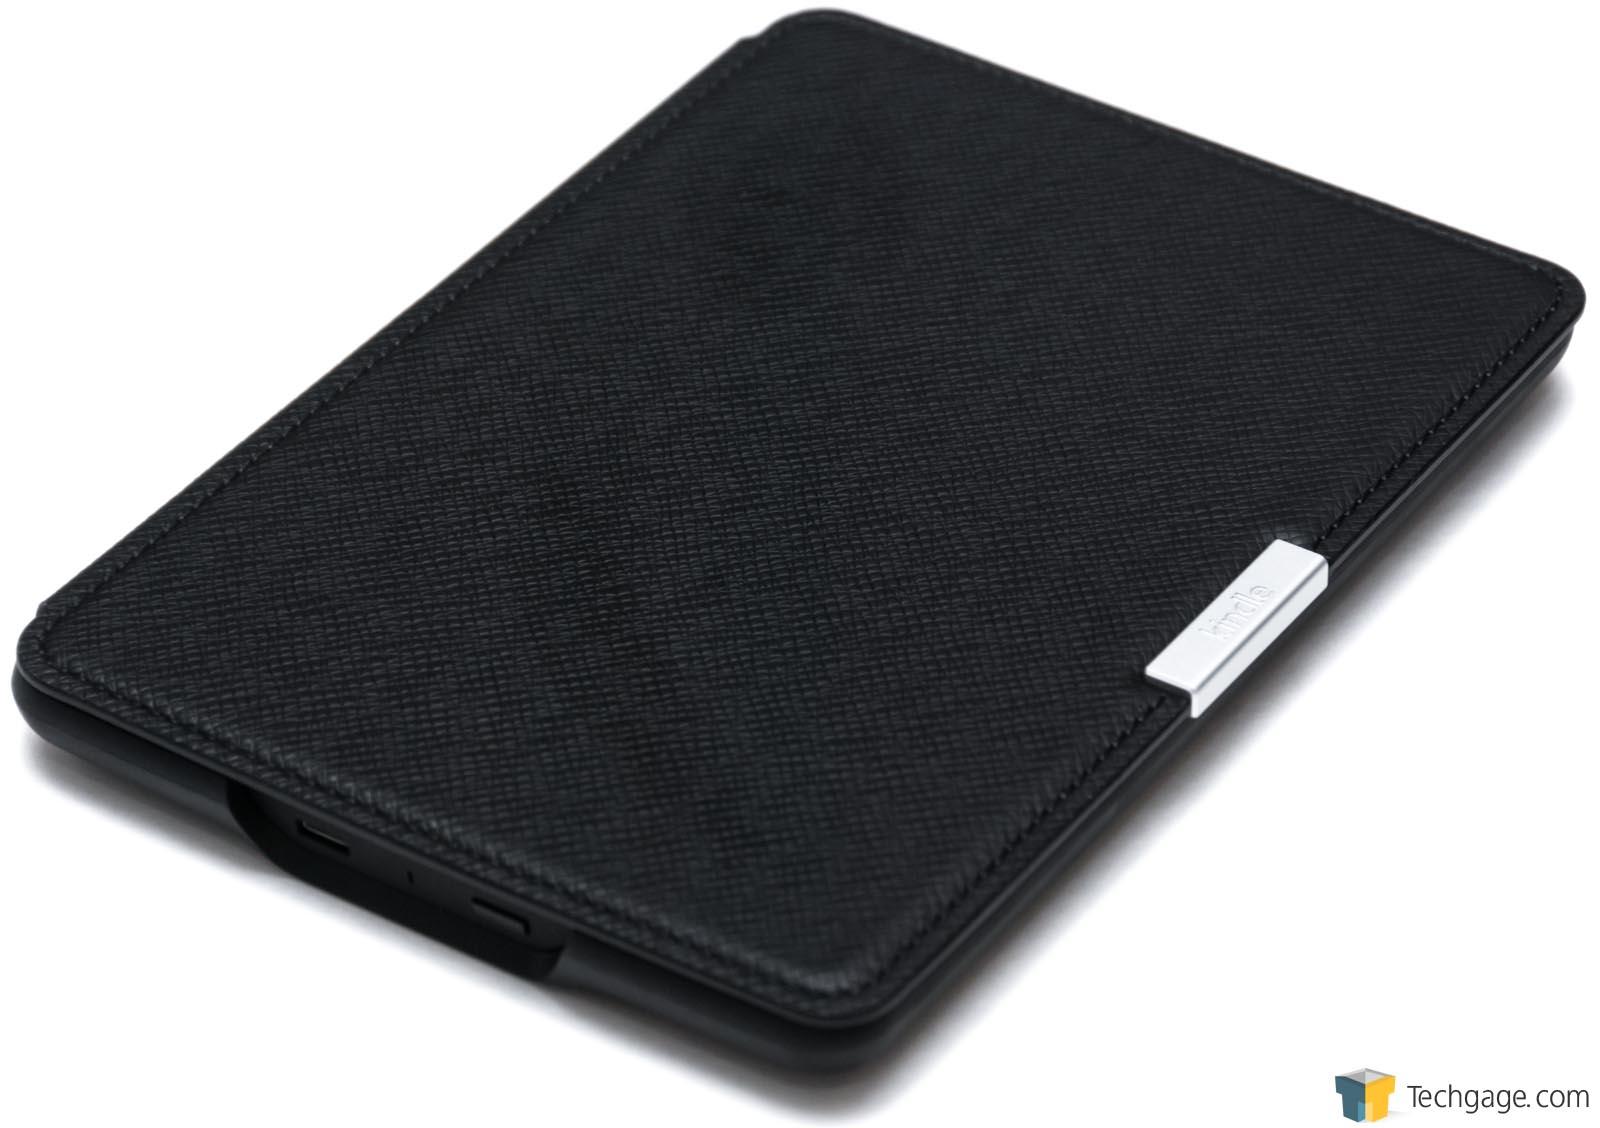 amazon kindle paperwhite 2015 review techgage